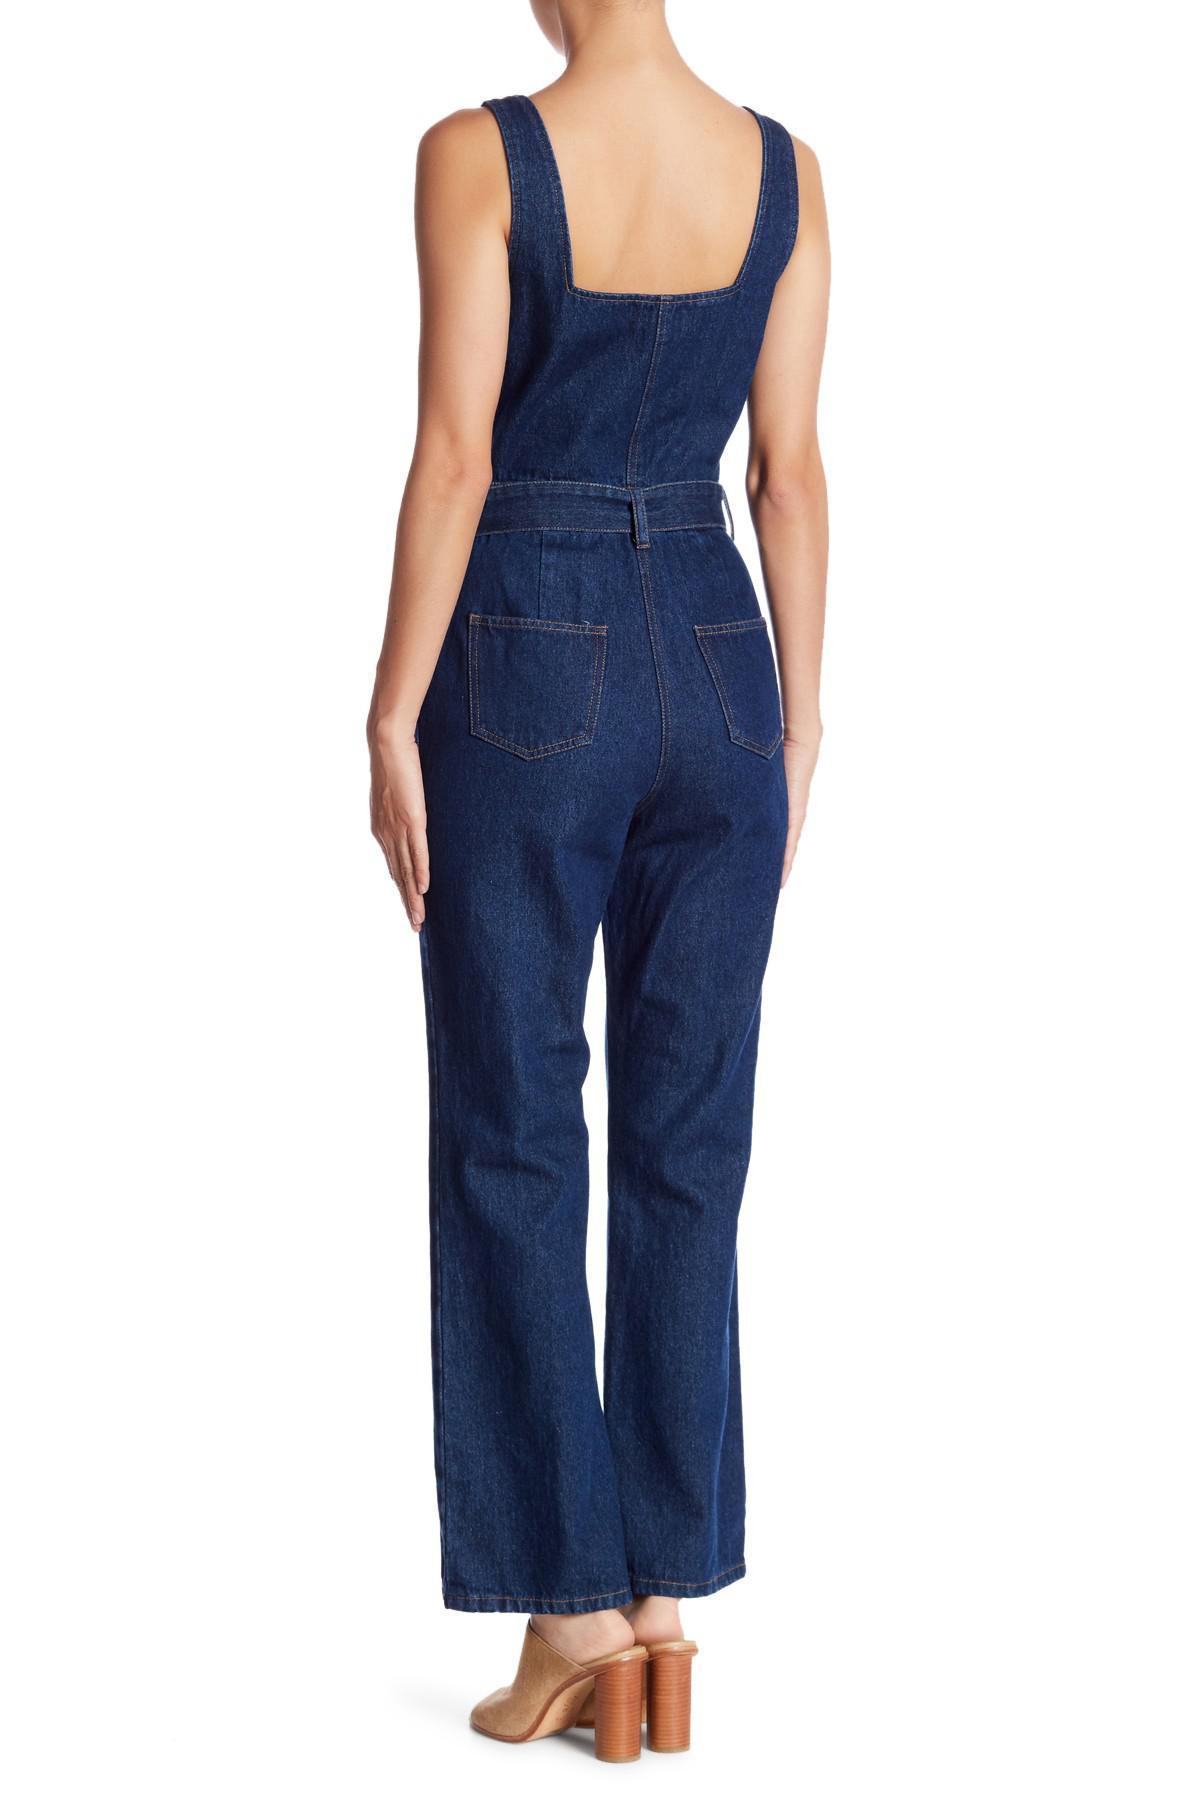 a28f4bff70a3 Honey Punch - Blue Belted Denim Jumpsuit - Lyst. View fullscreen